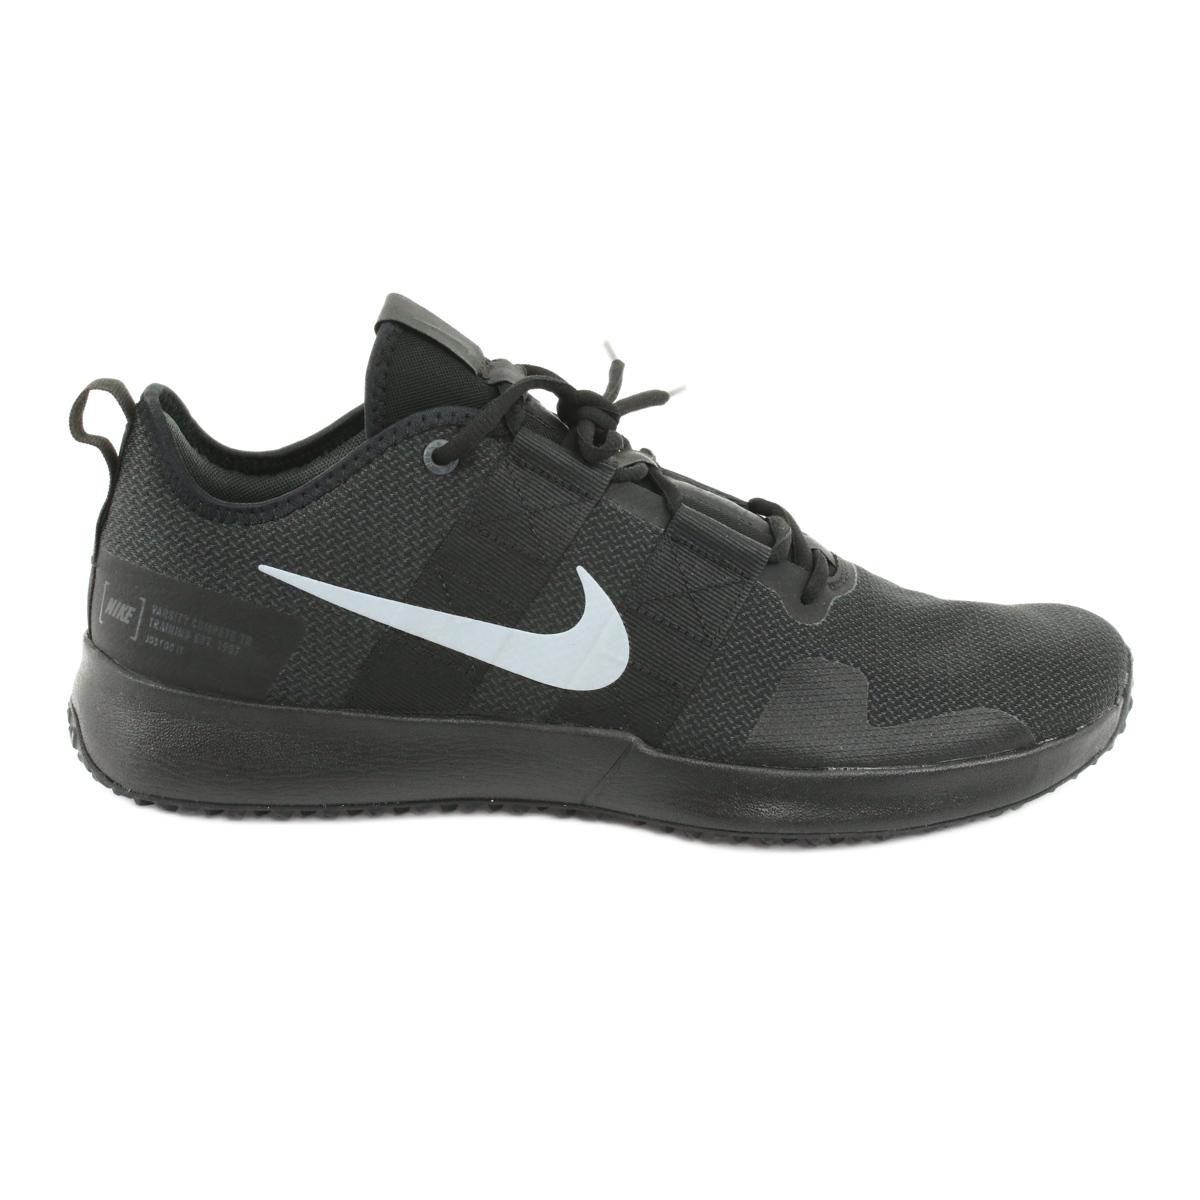 Nike Air Max Kantara, Chaussures de Running Compétition Homme